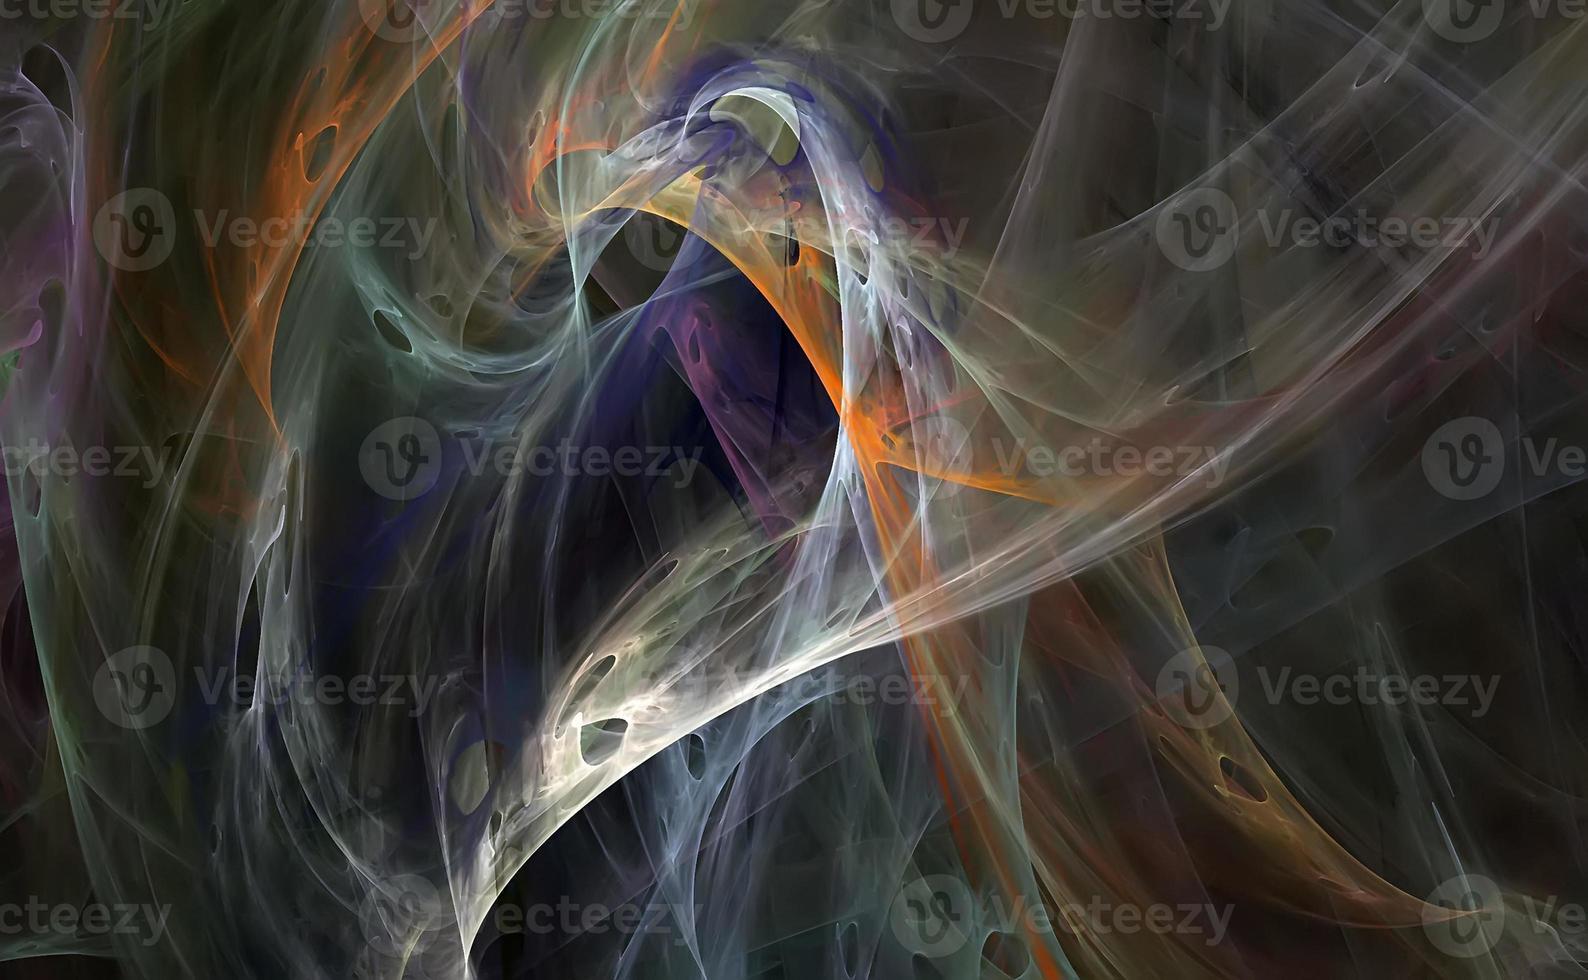 Nice fractal photo